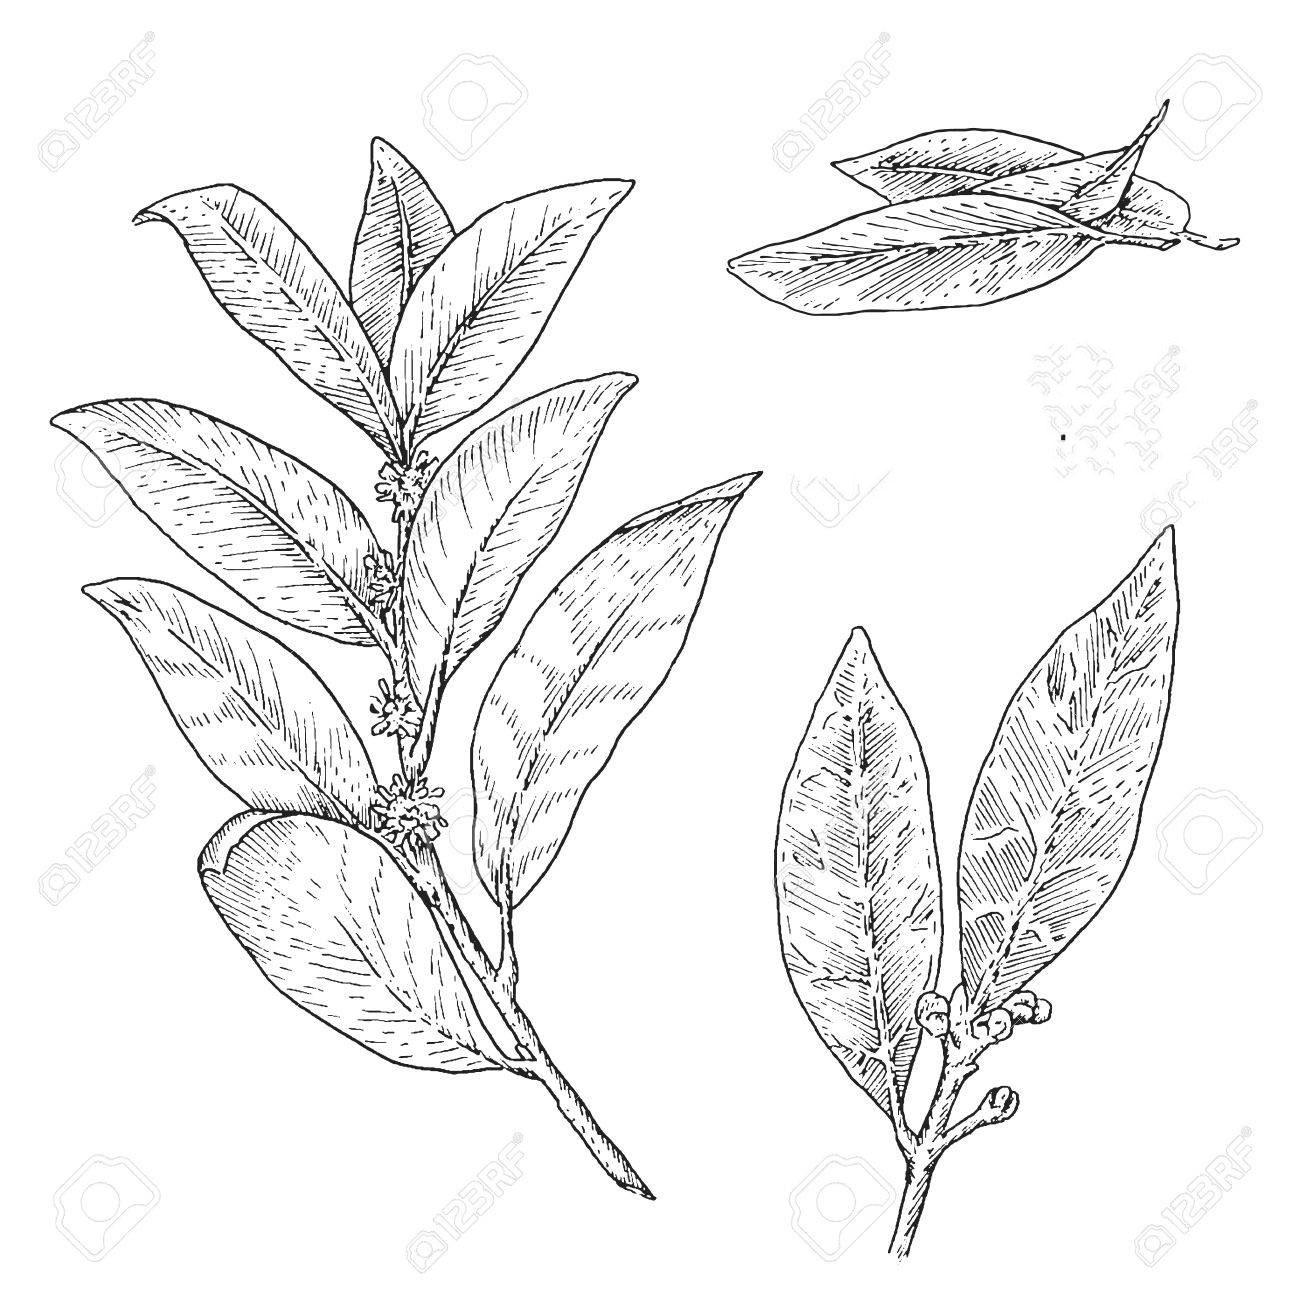 Sketch-of-Bay-Laurel